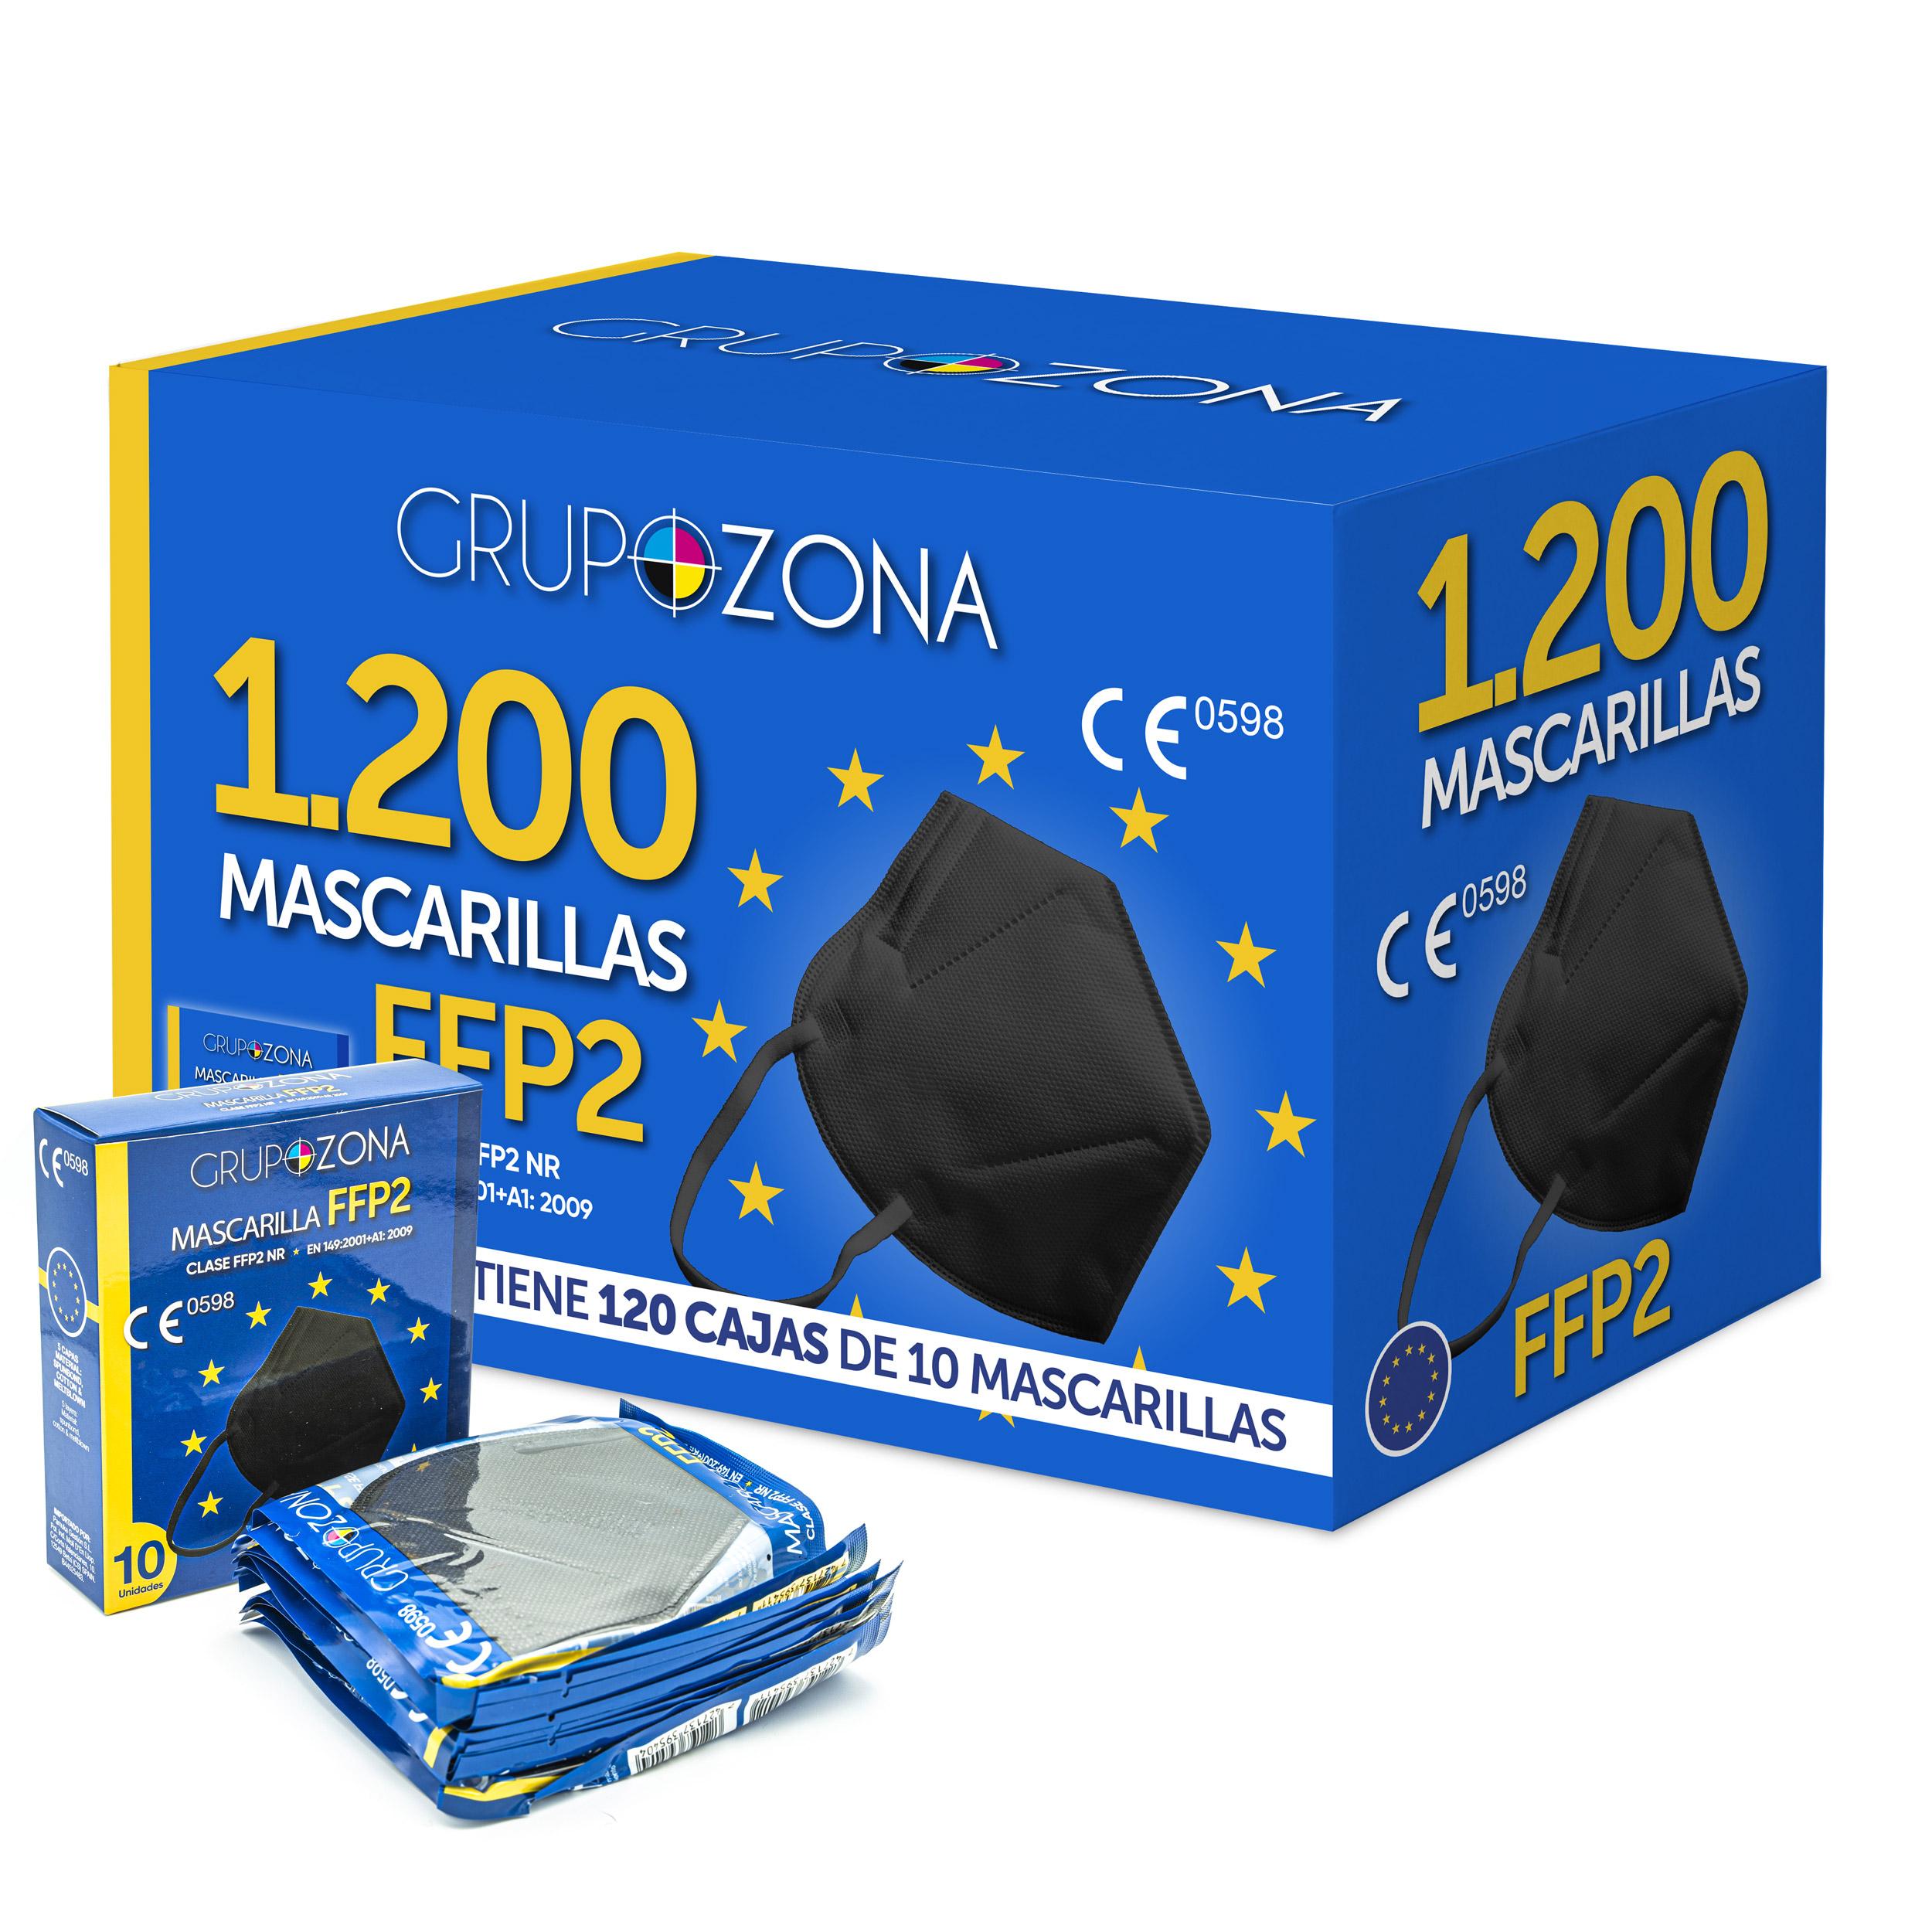 pack-1200-mascarillas-ffp2-grupozona-negras